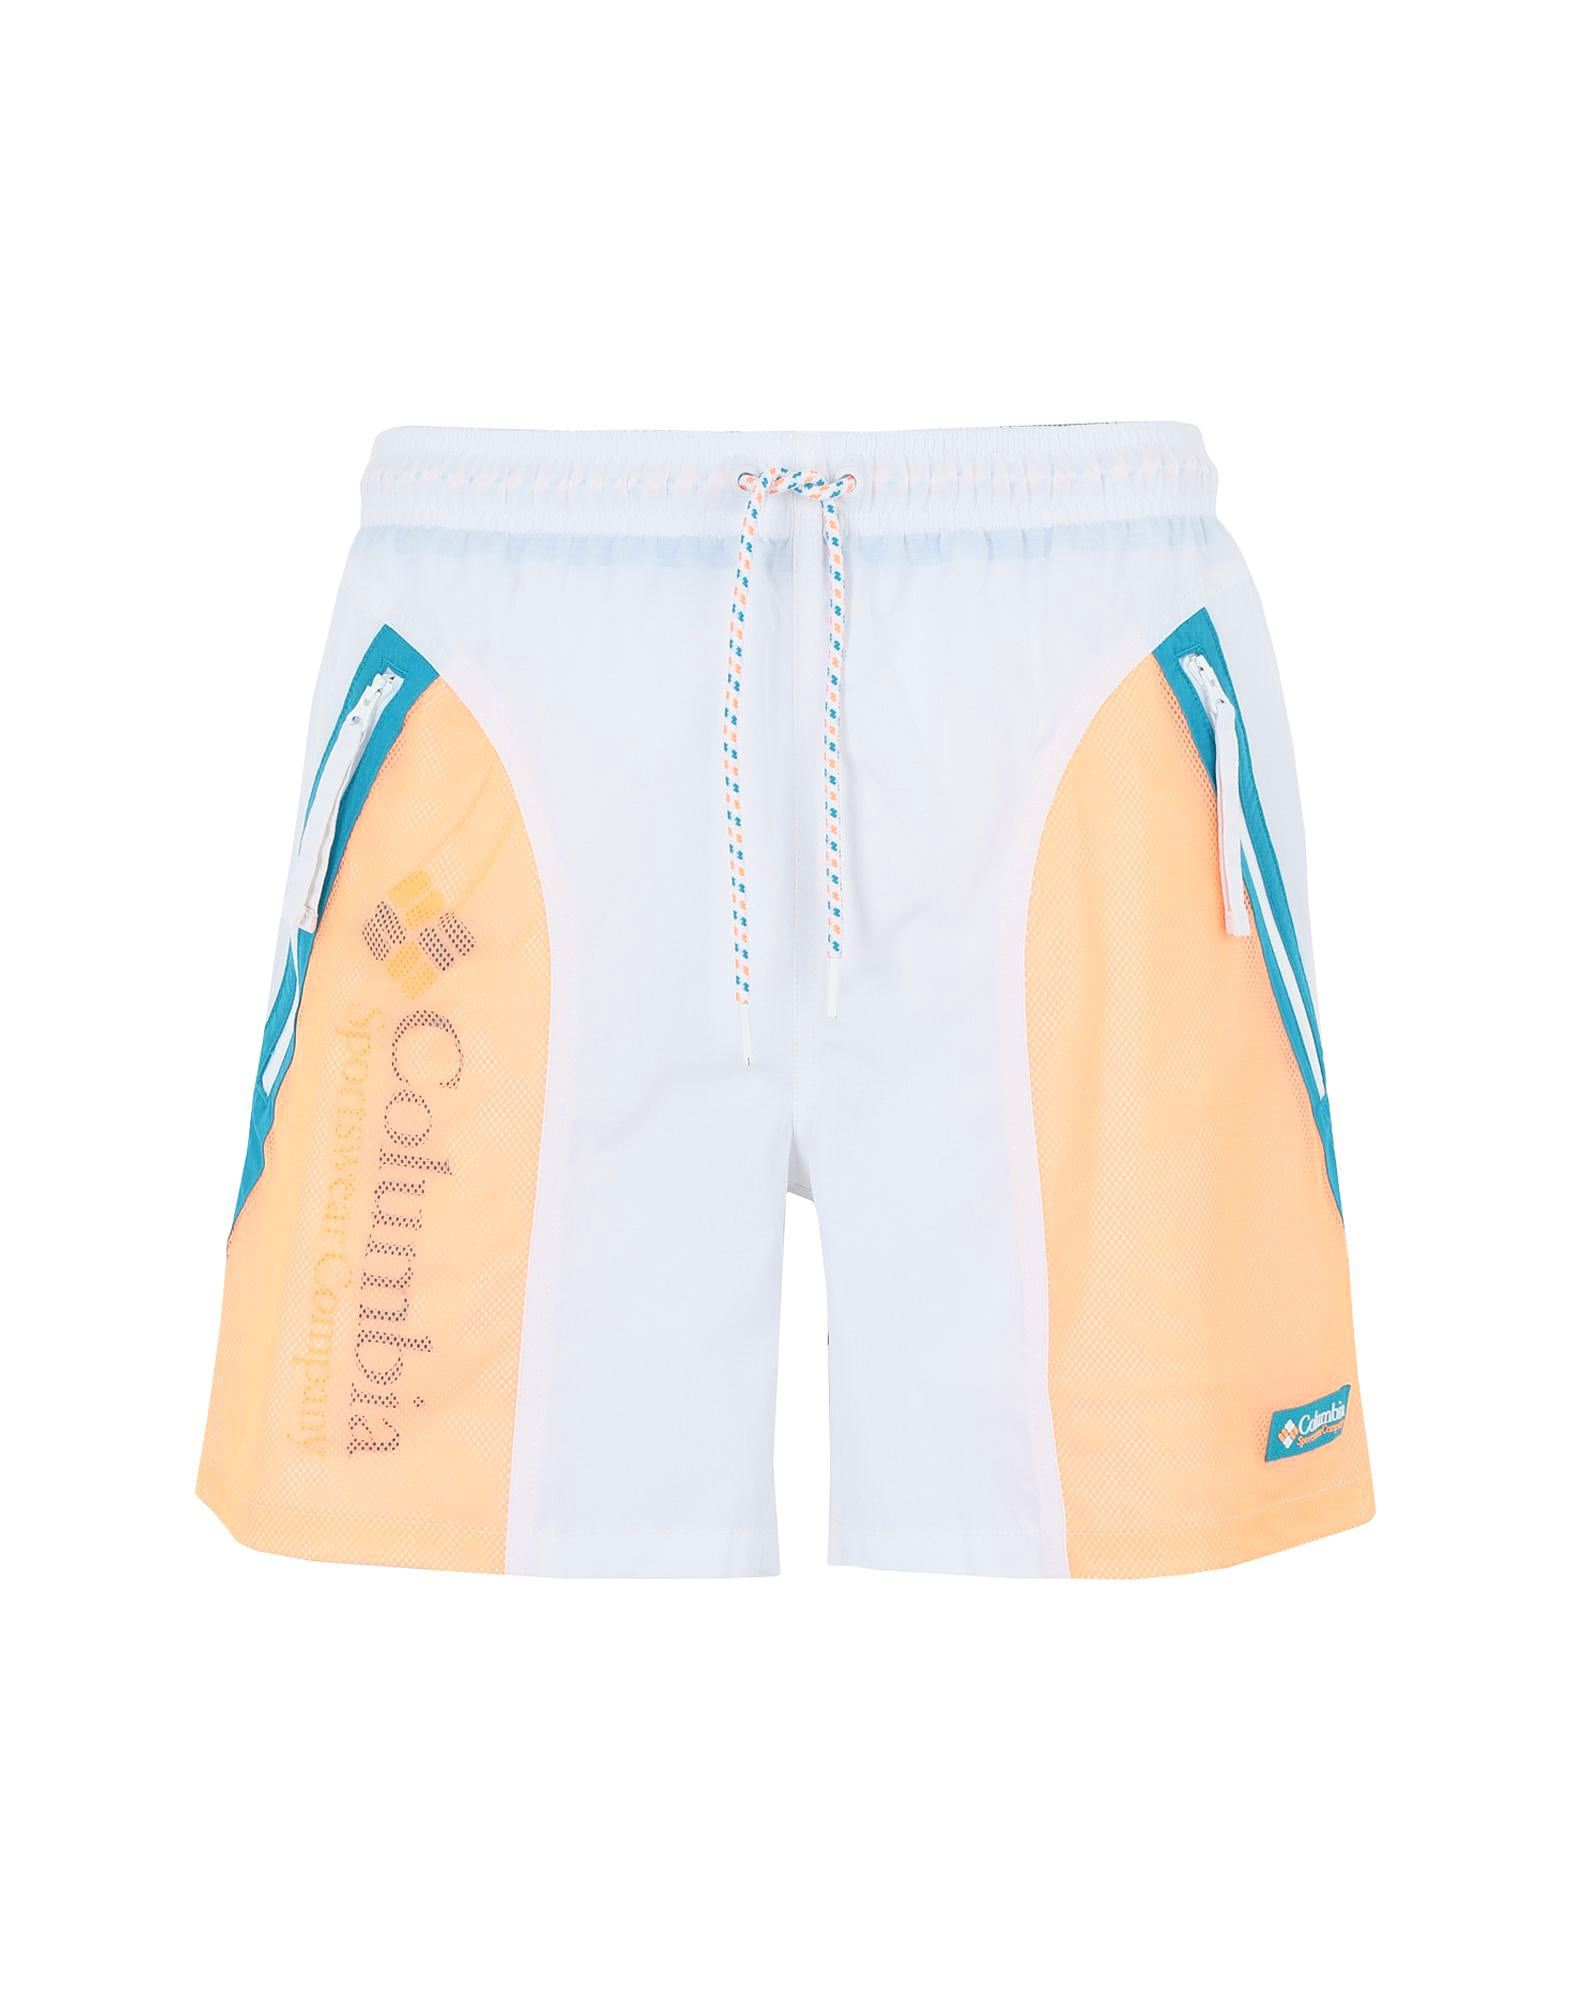 COLUMBIA Повседневные шорты брюки спортивные columbia columbia anytime outdoor boot cut pant